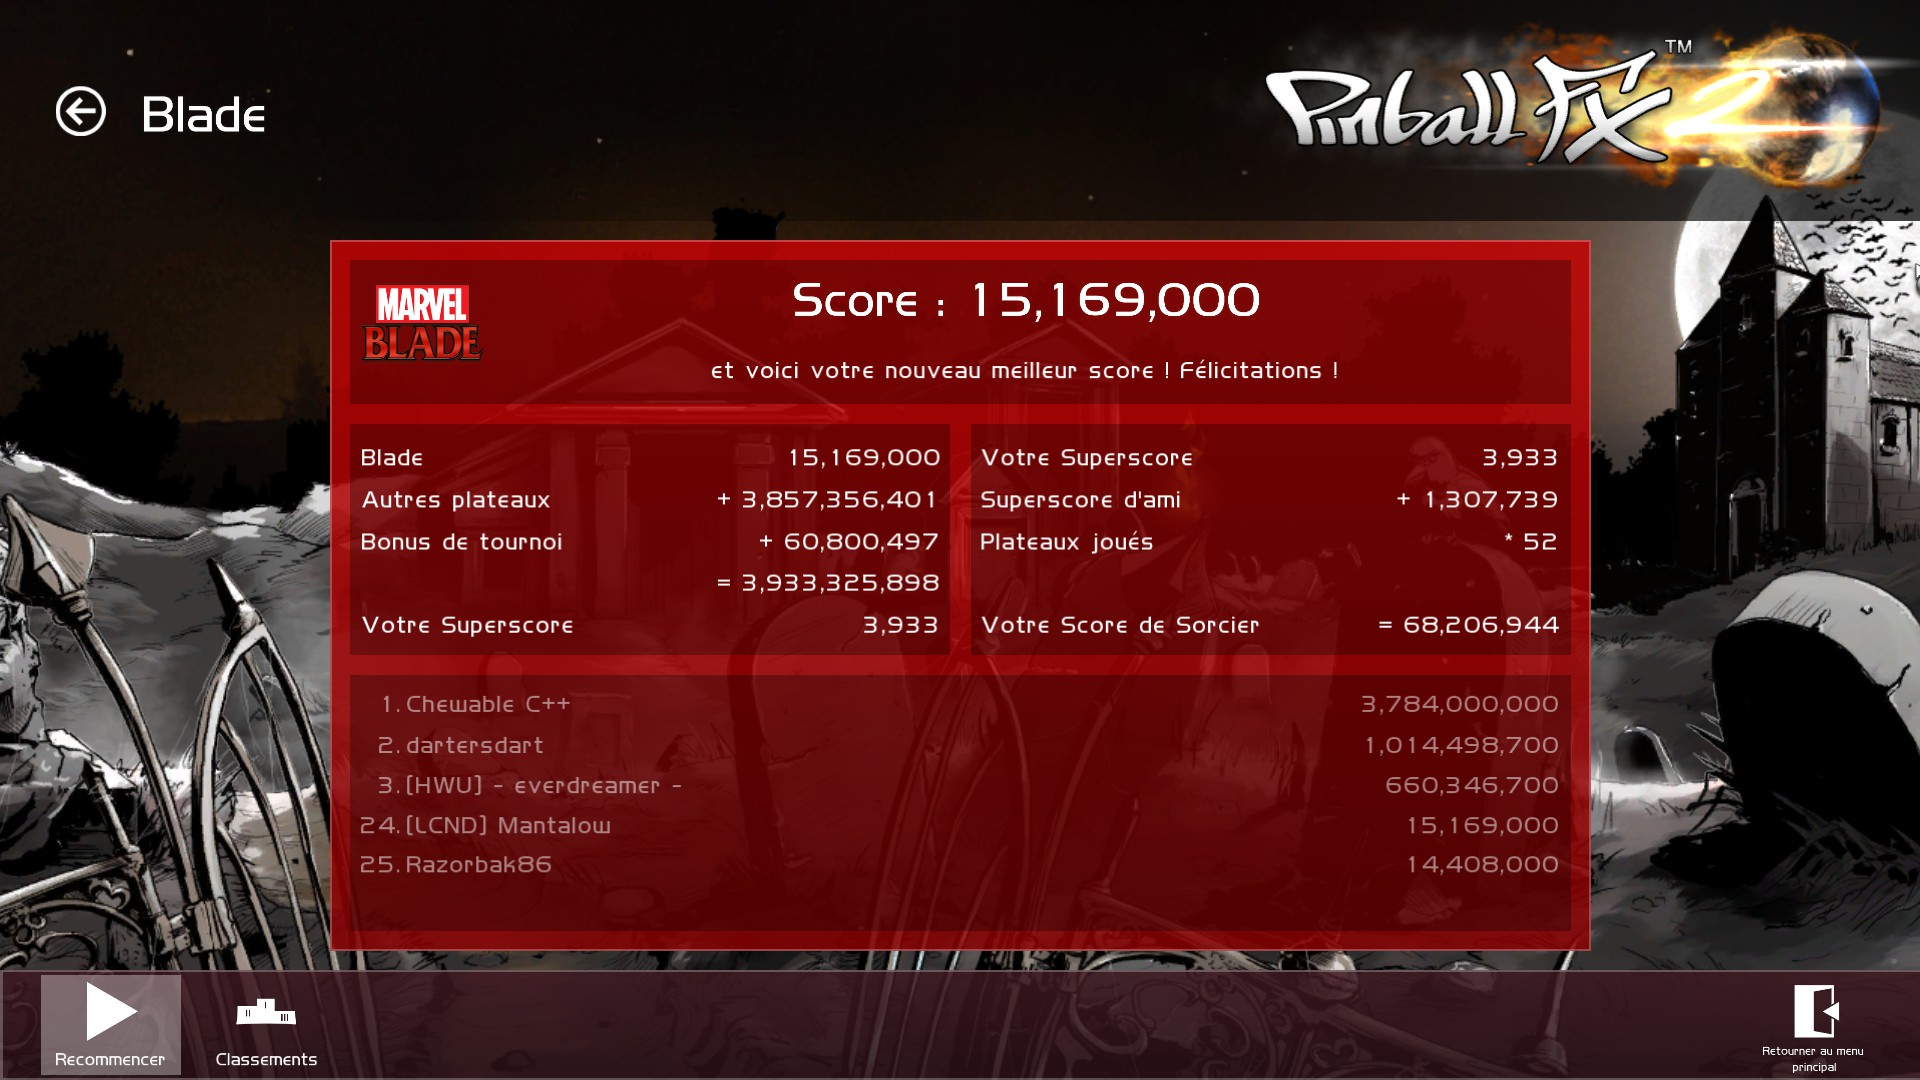 Mantalow: Pinball FX 2: Blade (PC) 15,169,000 points on 2015-06-27 07:40:50